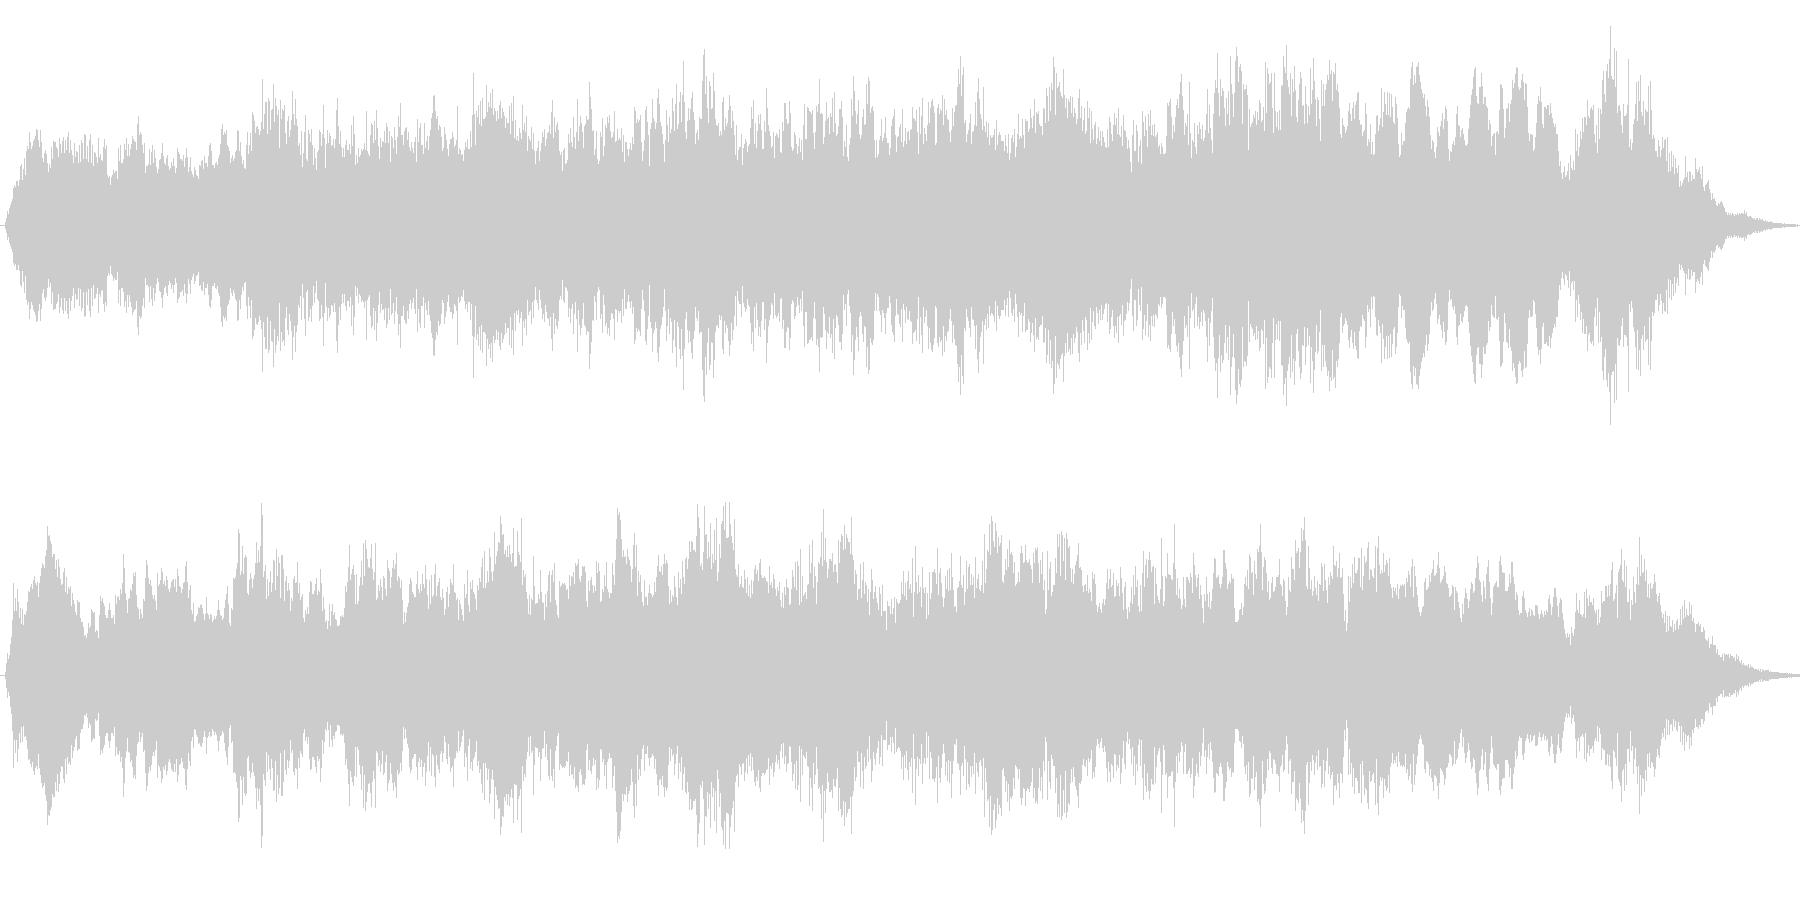 G線上のアリア・優雅な弦楽合奏15sの未再生の波形